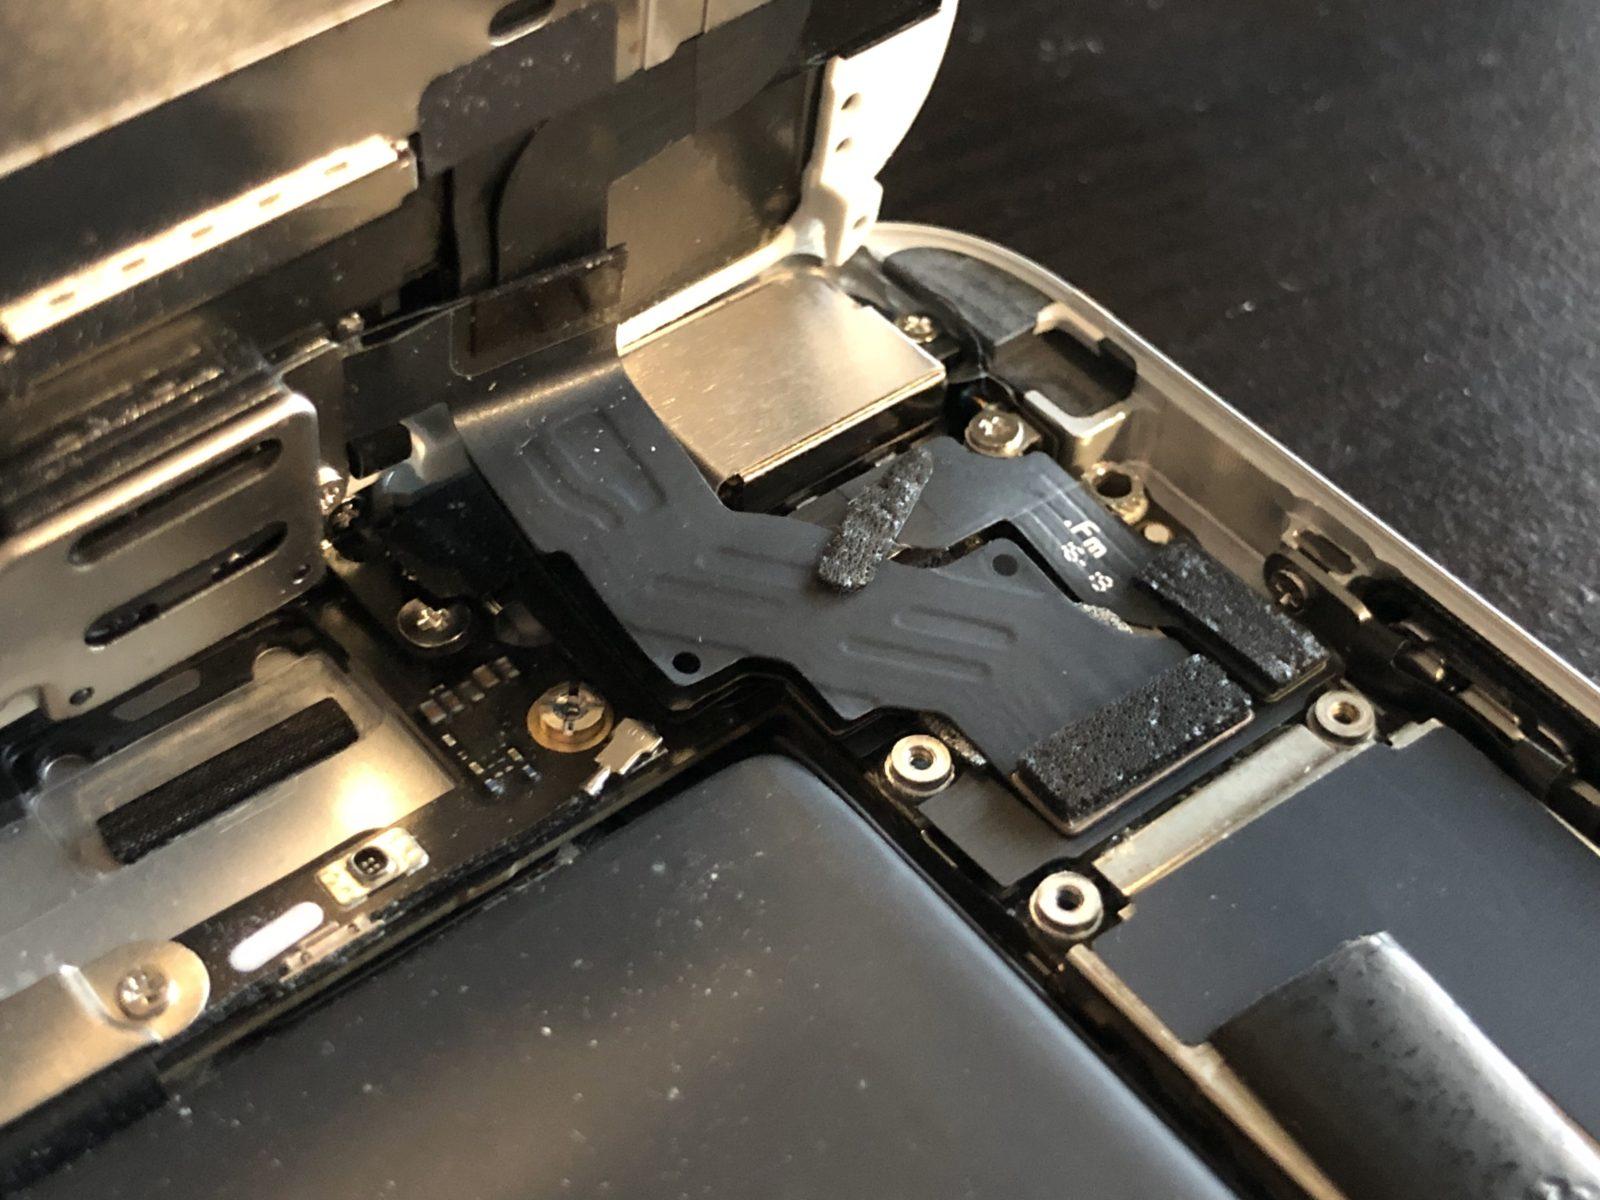 iPhone 6 Plus con la zona del chip defectuoso expuesta